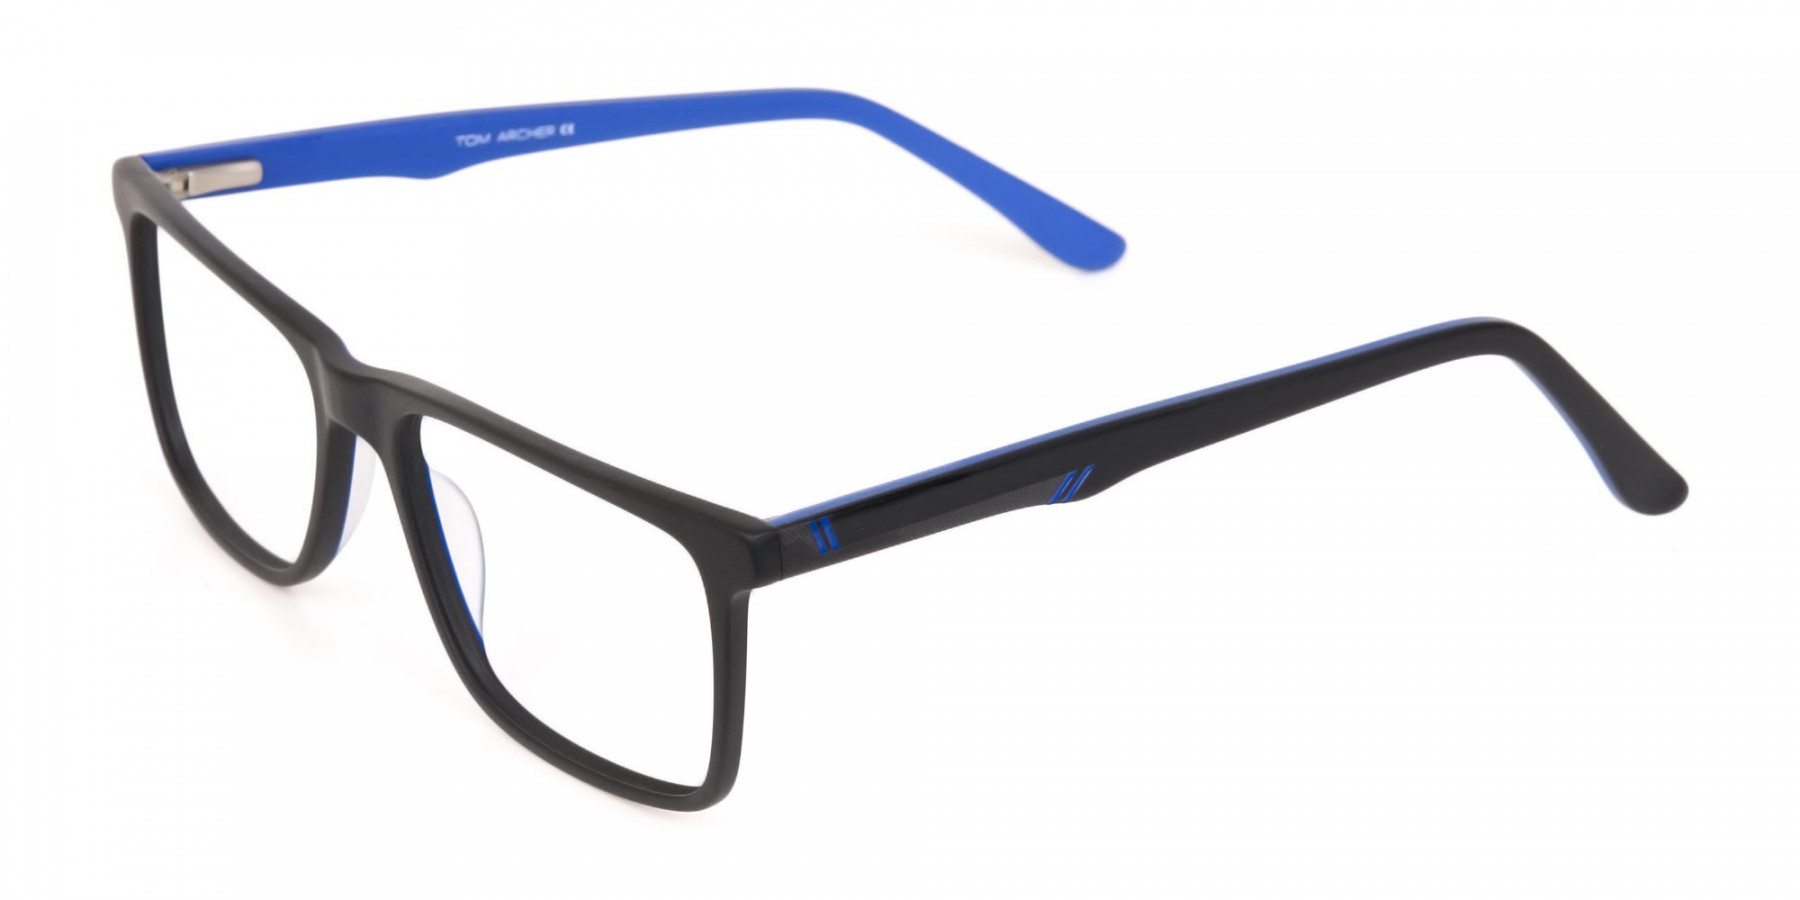 Designer Matte Black & Silver Blue Glasses Unisex-1